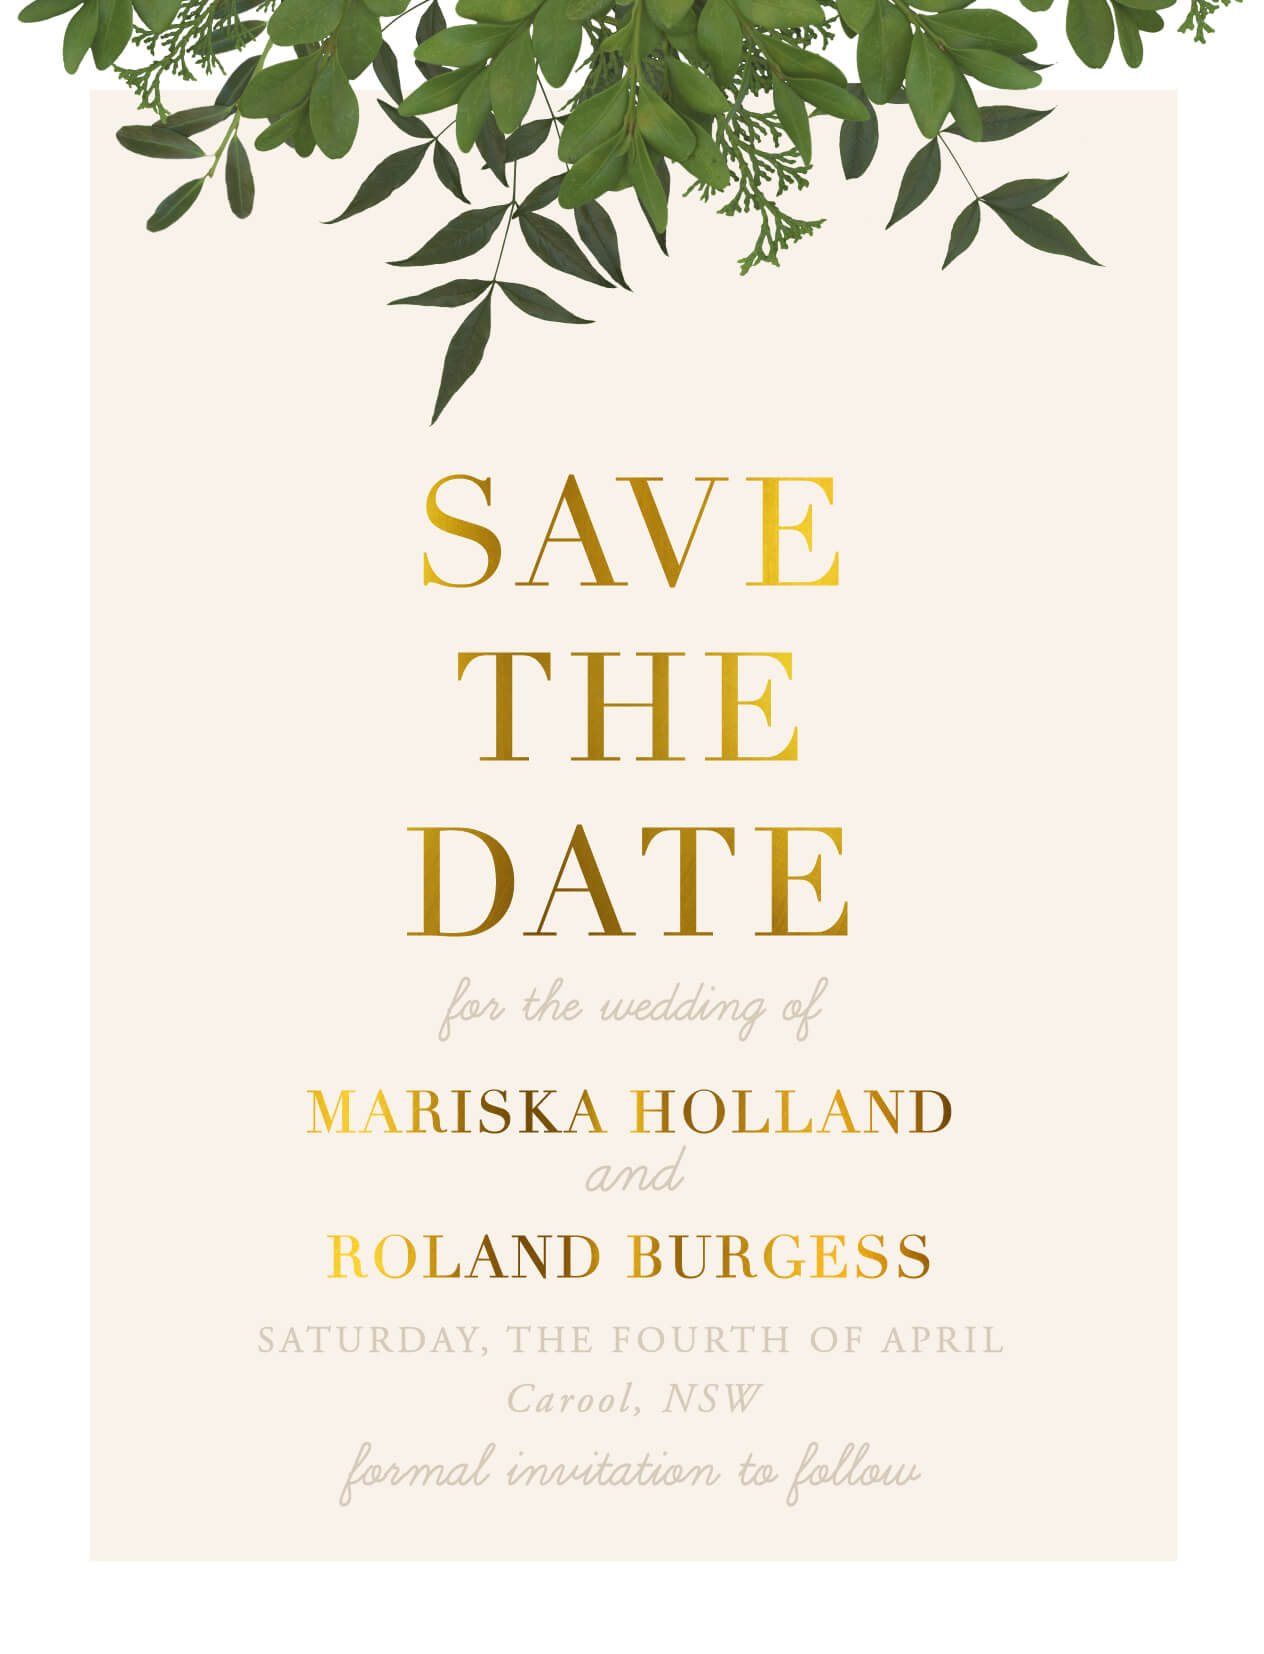 Mod Botanical - Save The Date